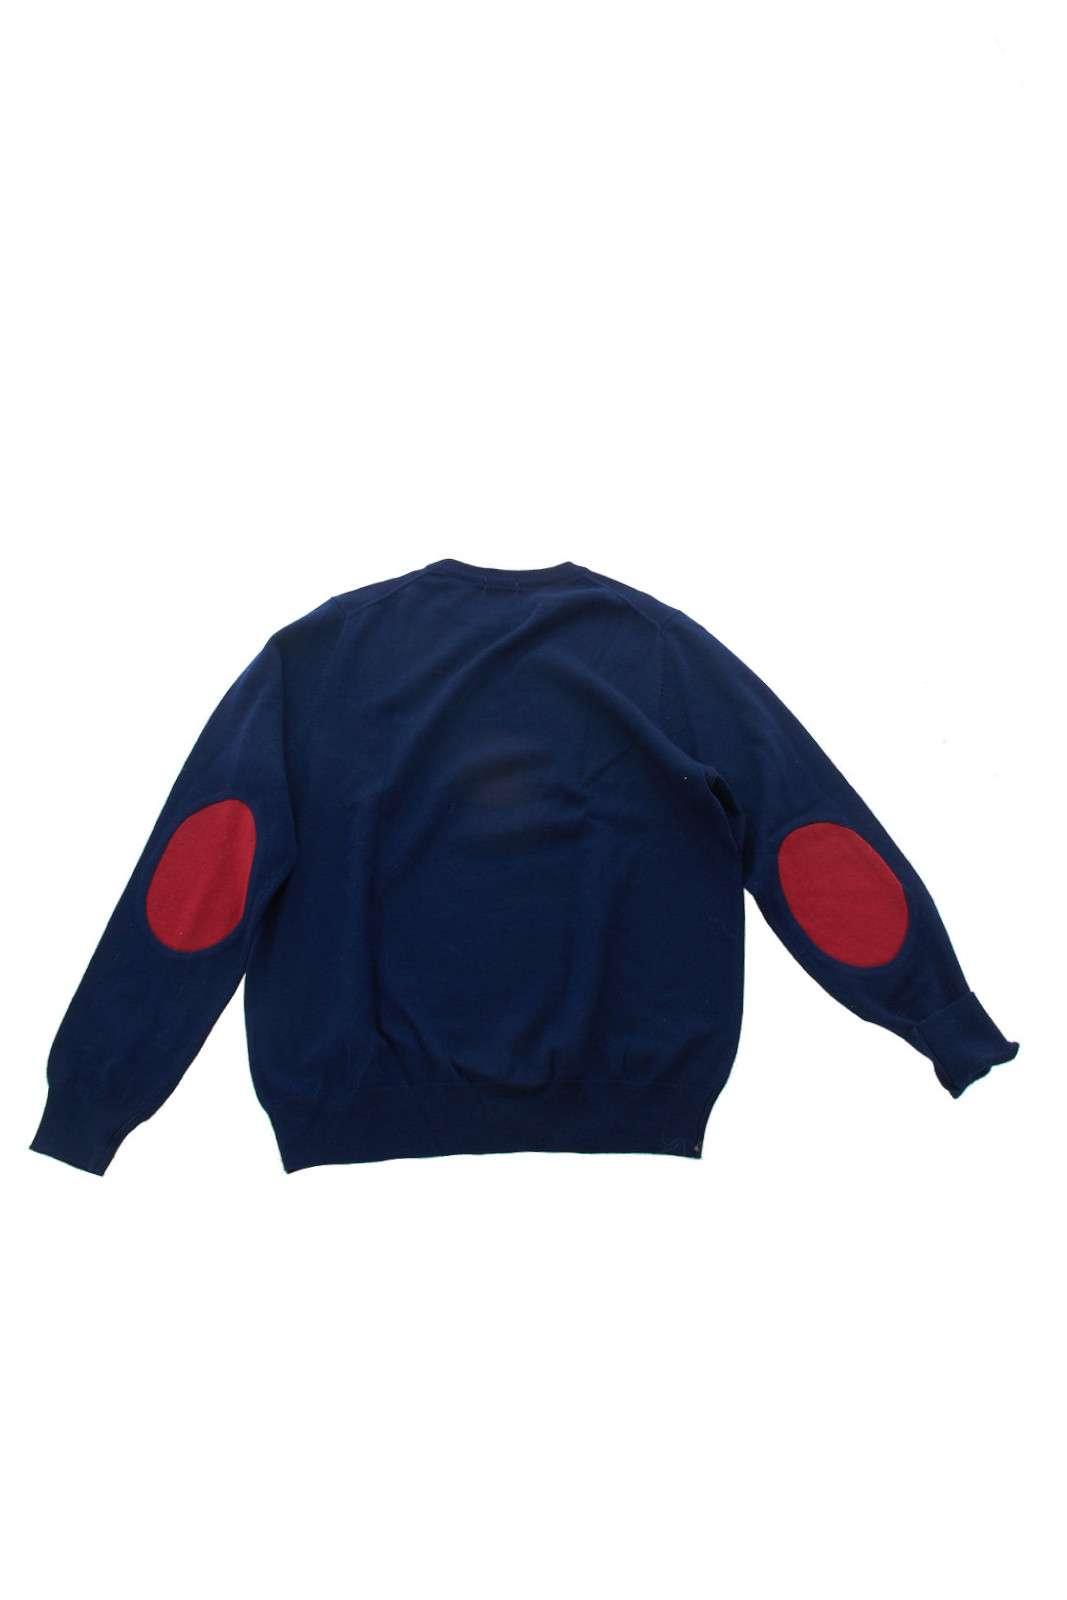 https://www.parmax.com/media/catalog/product/a/i/AI-outlet_parmax-maglia-bambino-sun%2068-26354-B.jpg